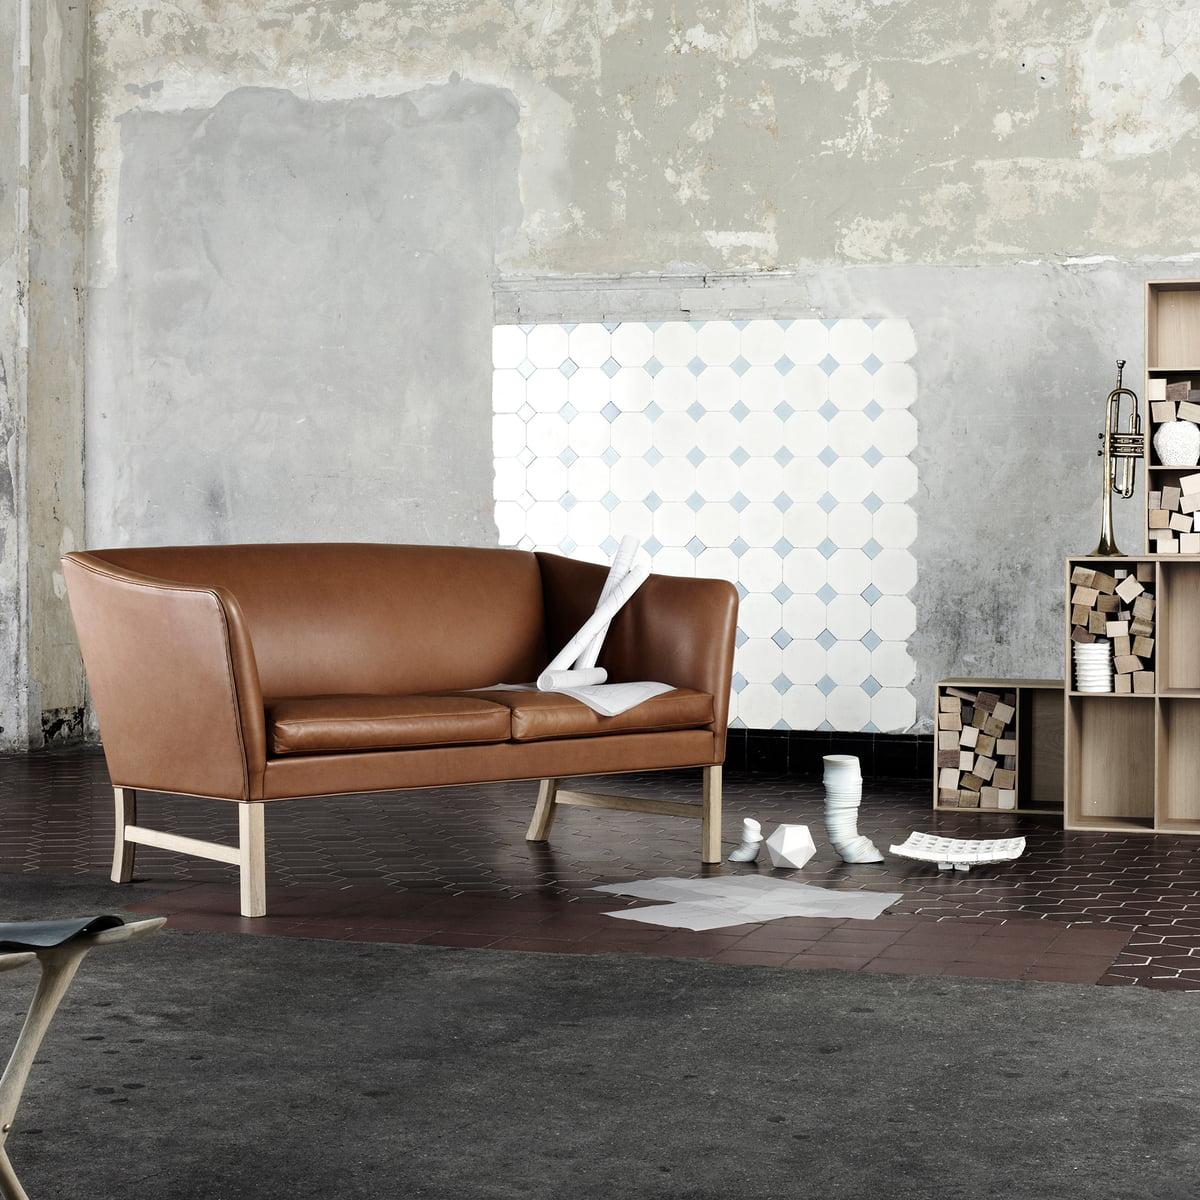 A Clic Example Of Danish Design